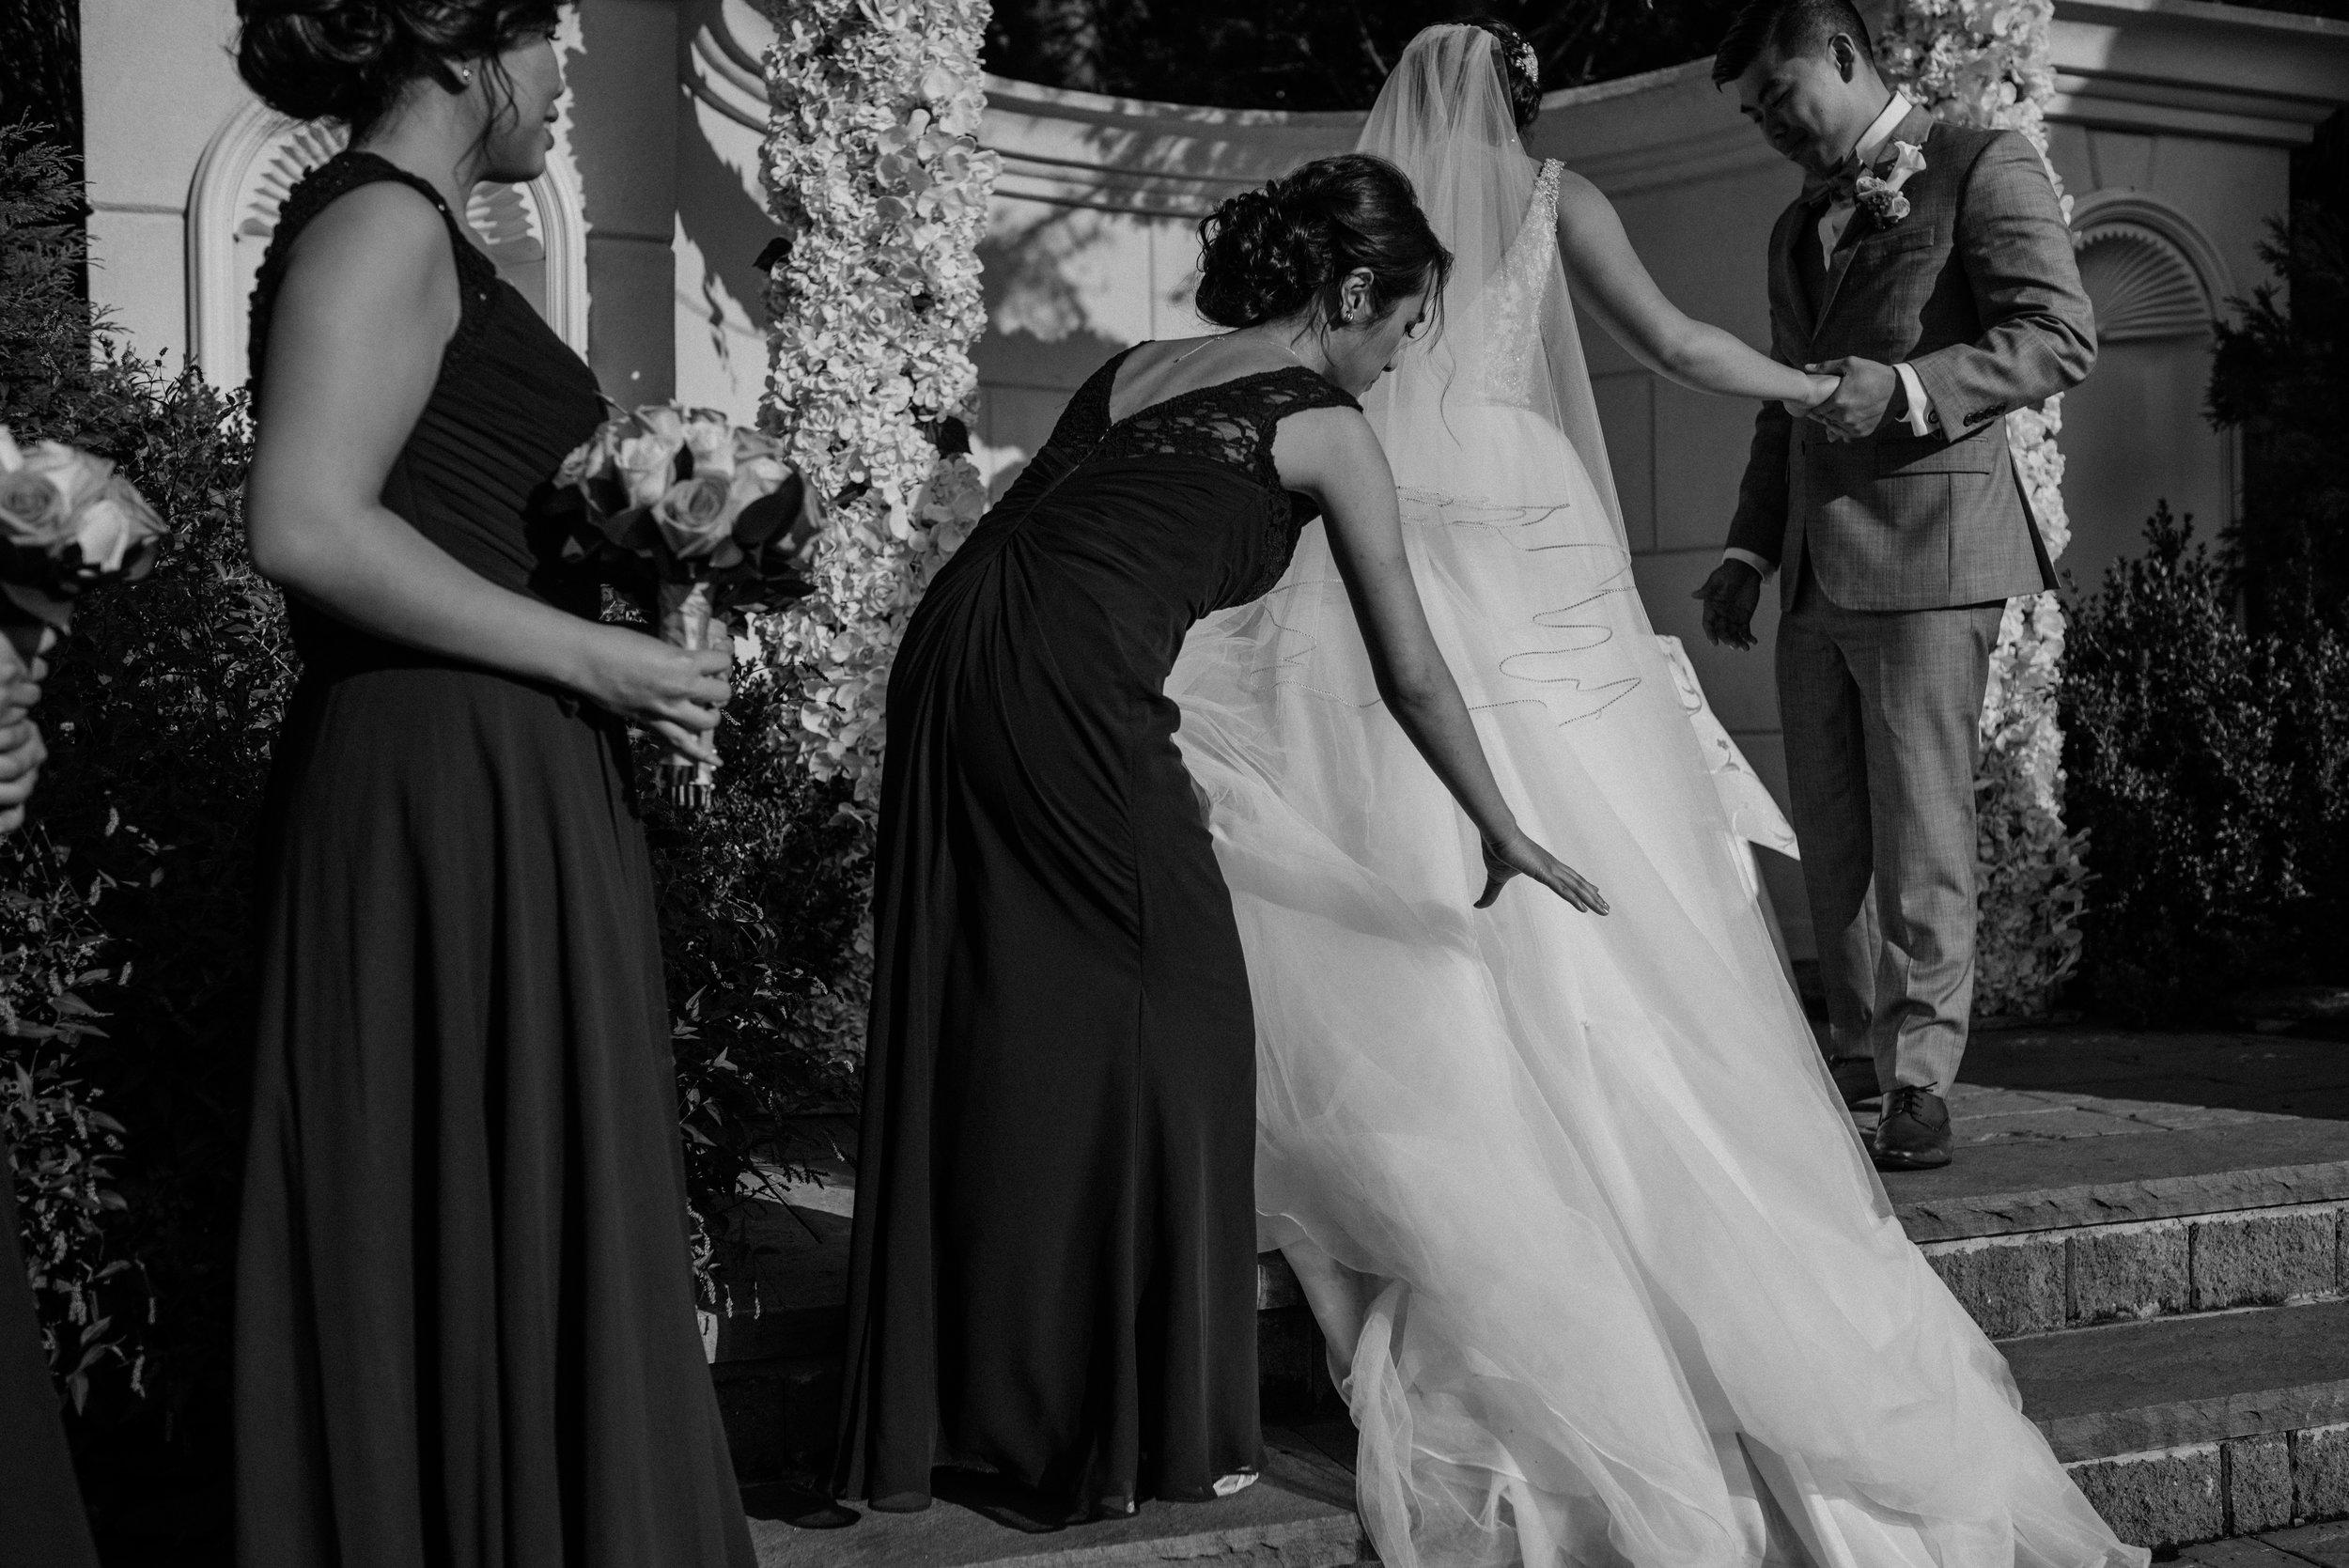 Main and Simple Photography_2017_Weddings_NewYork_TinaJon-989.jpg